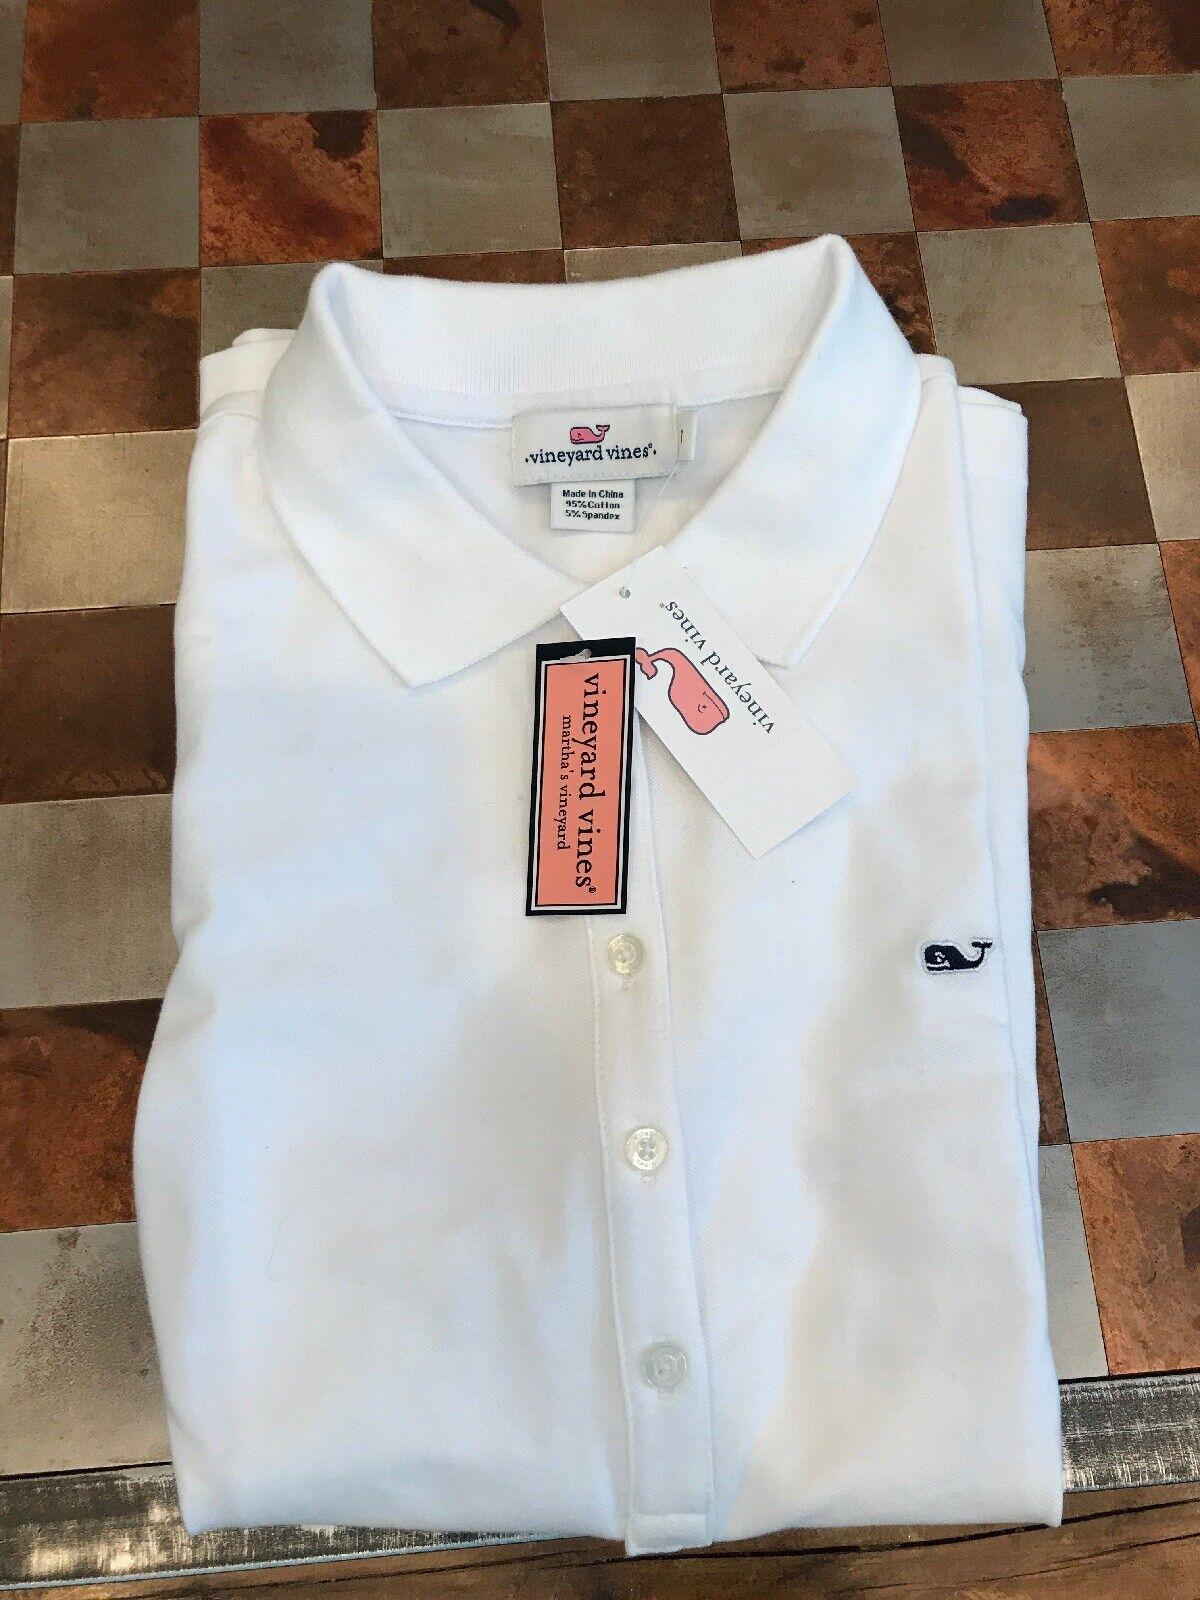 damen's Vineyard Vines Weiß Polo Shirt - Extra Small NWT